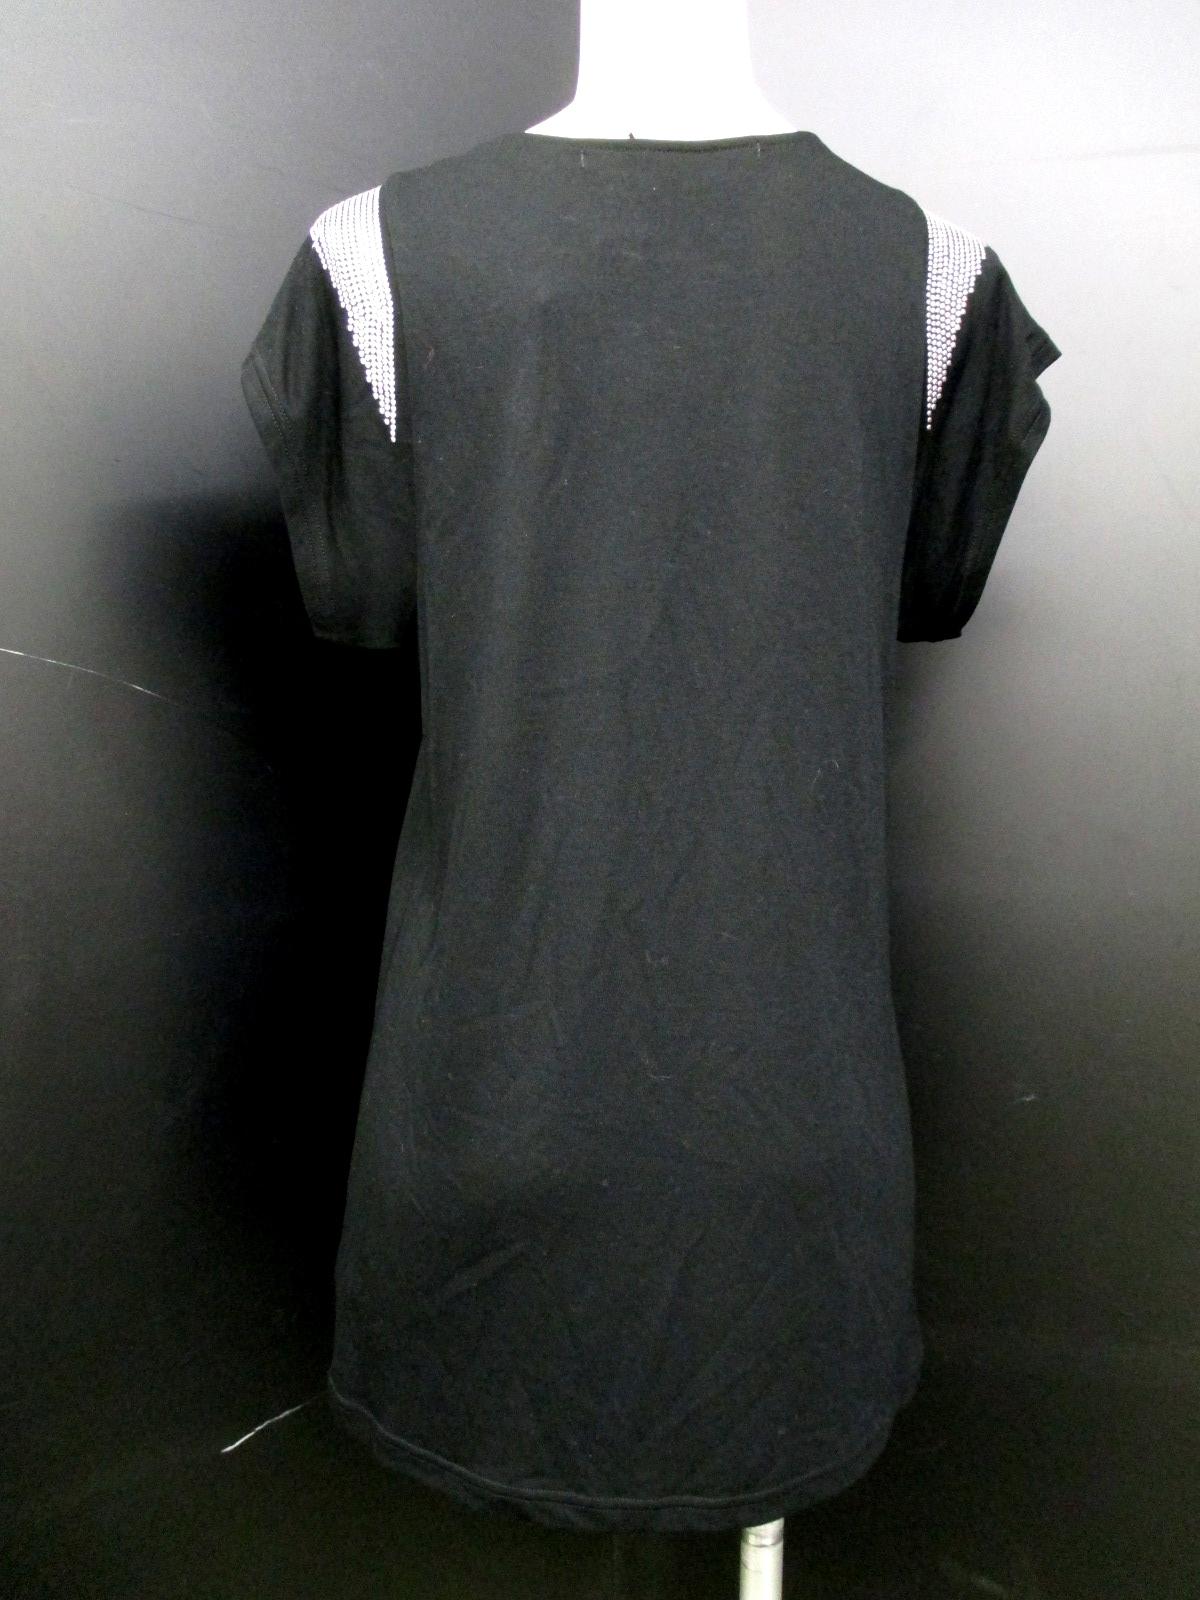 NATTAHNAM(ナターナム)のTシャツ